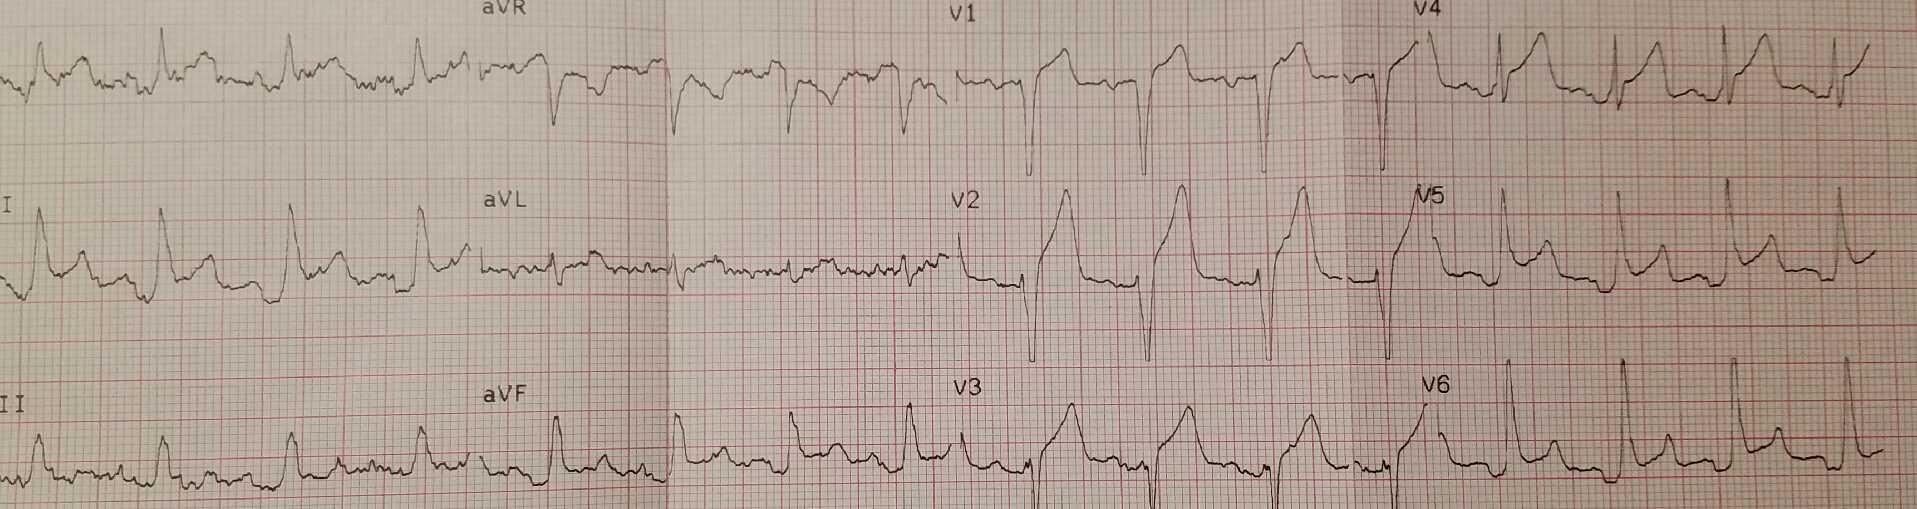 Acute myocardial injury on EKG